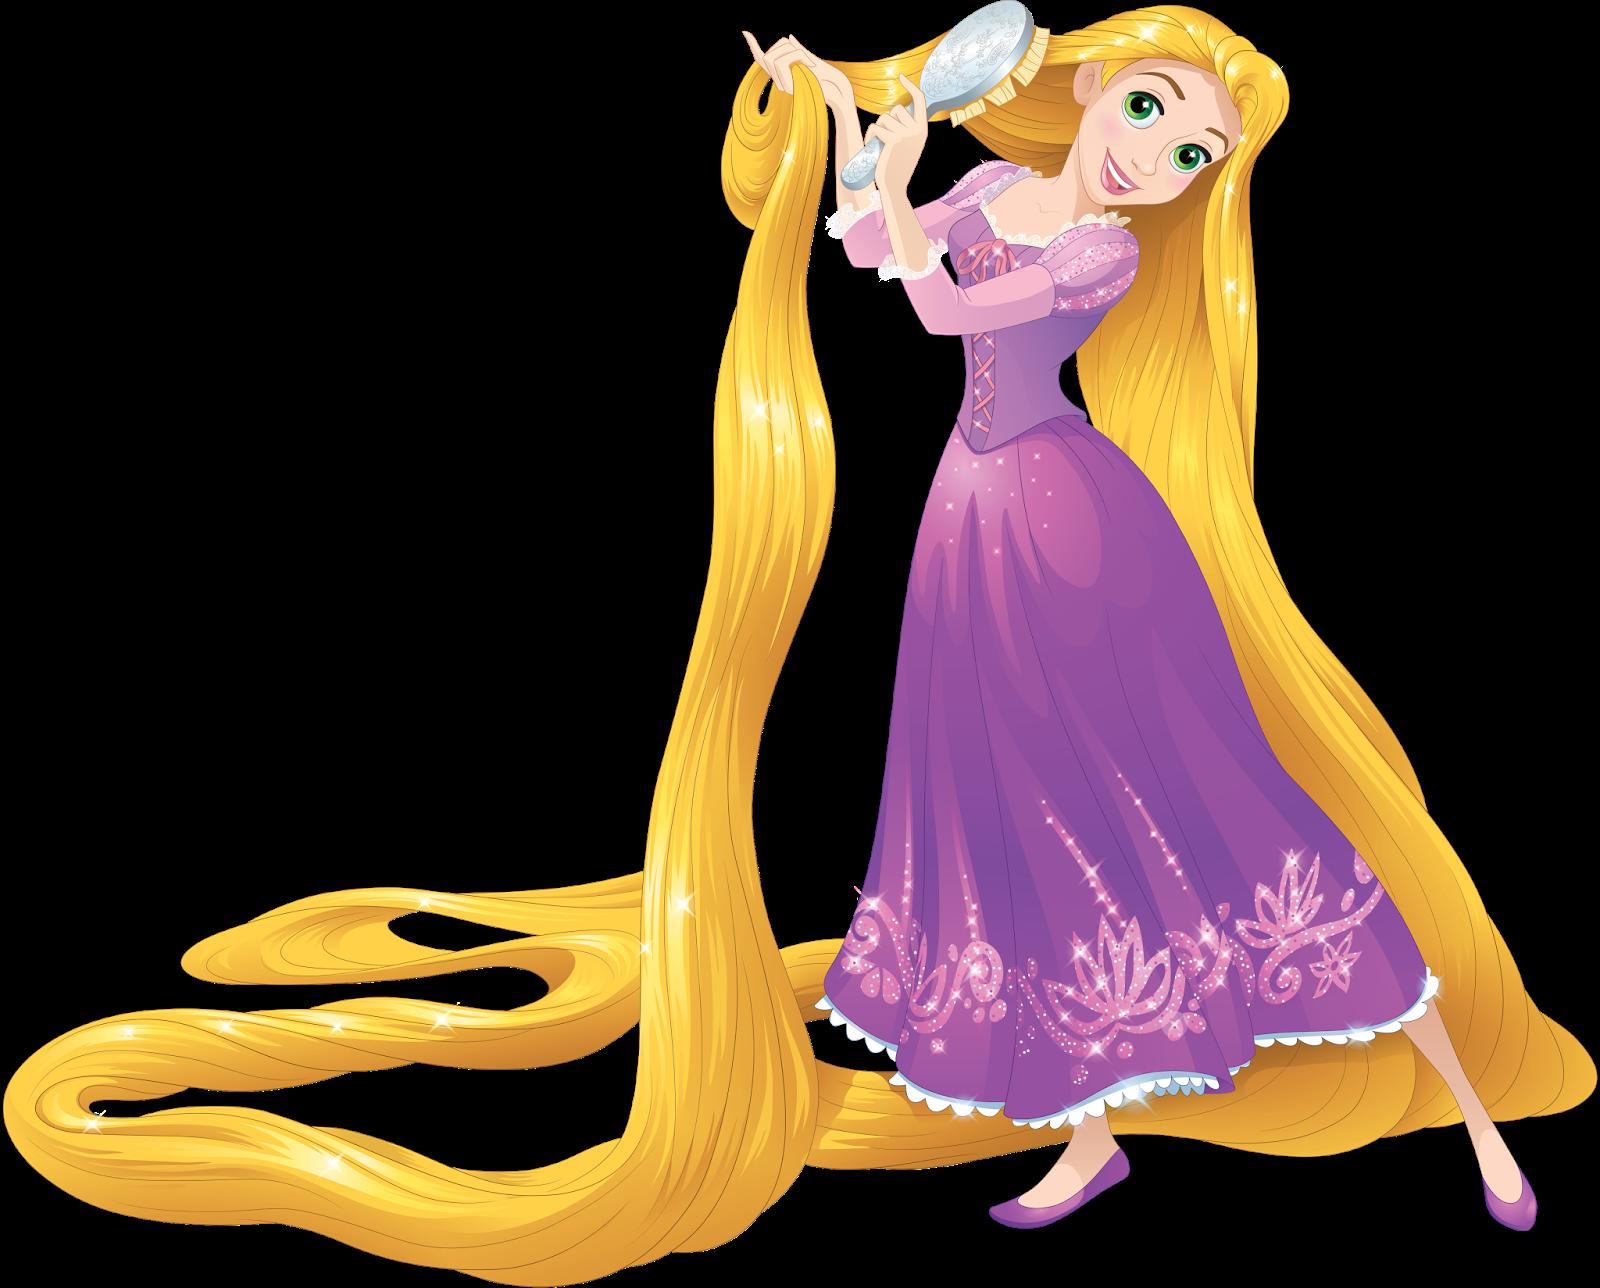 Rapunzel Brushing her Hair.pn